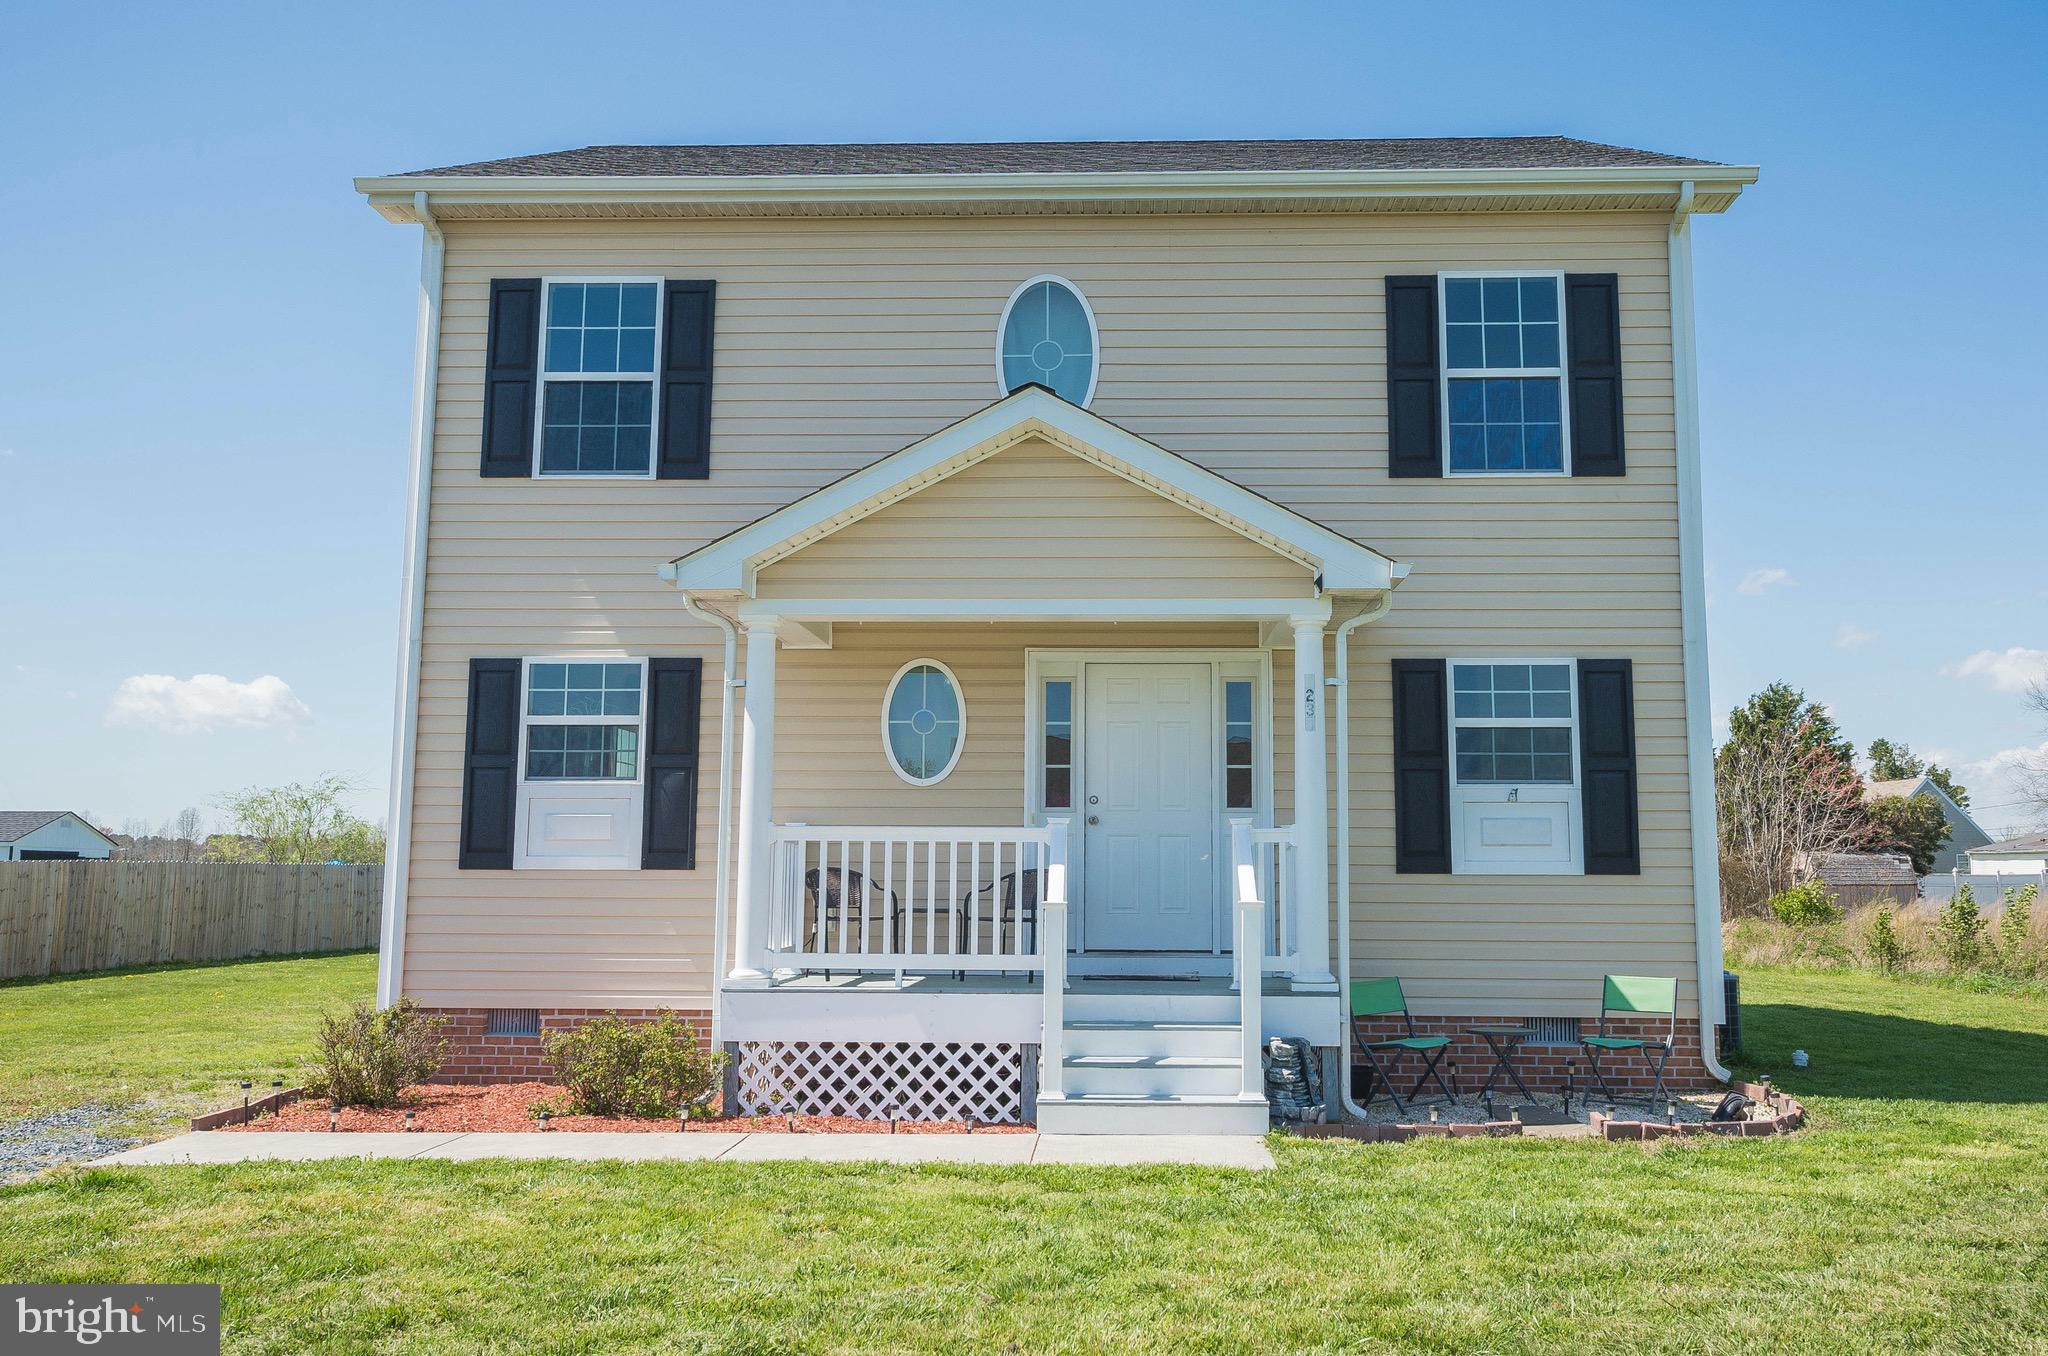 7230 Chatham Manor Way, Pittsville, MD 21850